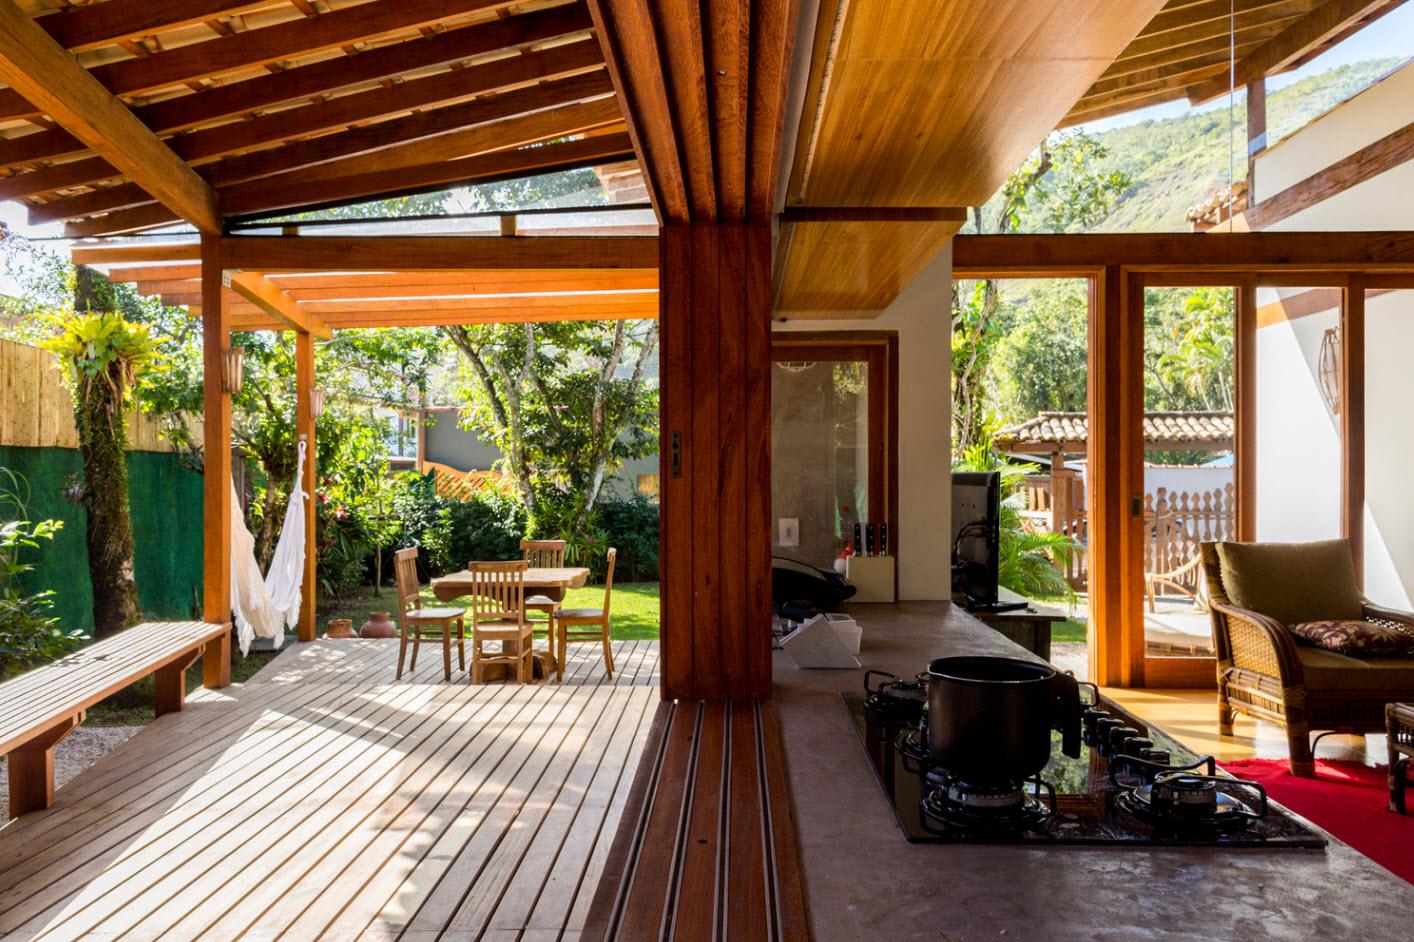 Dise o de peque a casa en la selva for Diseno de la casa interior